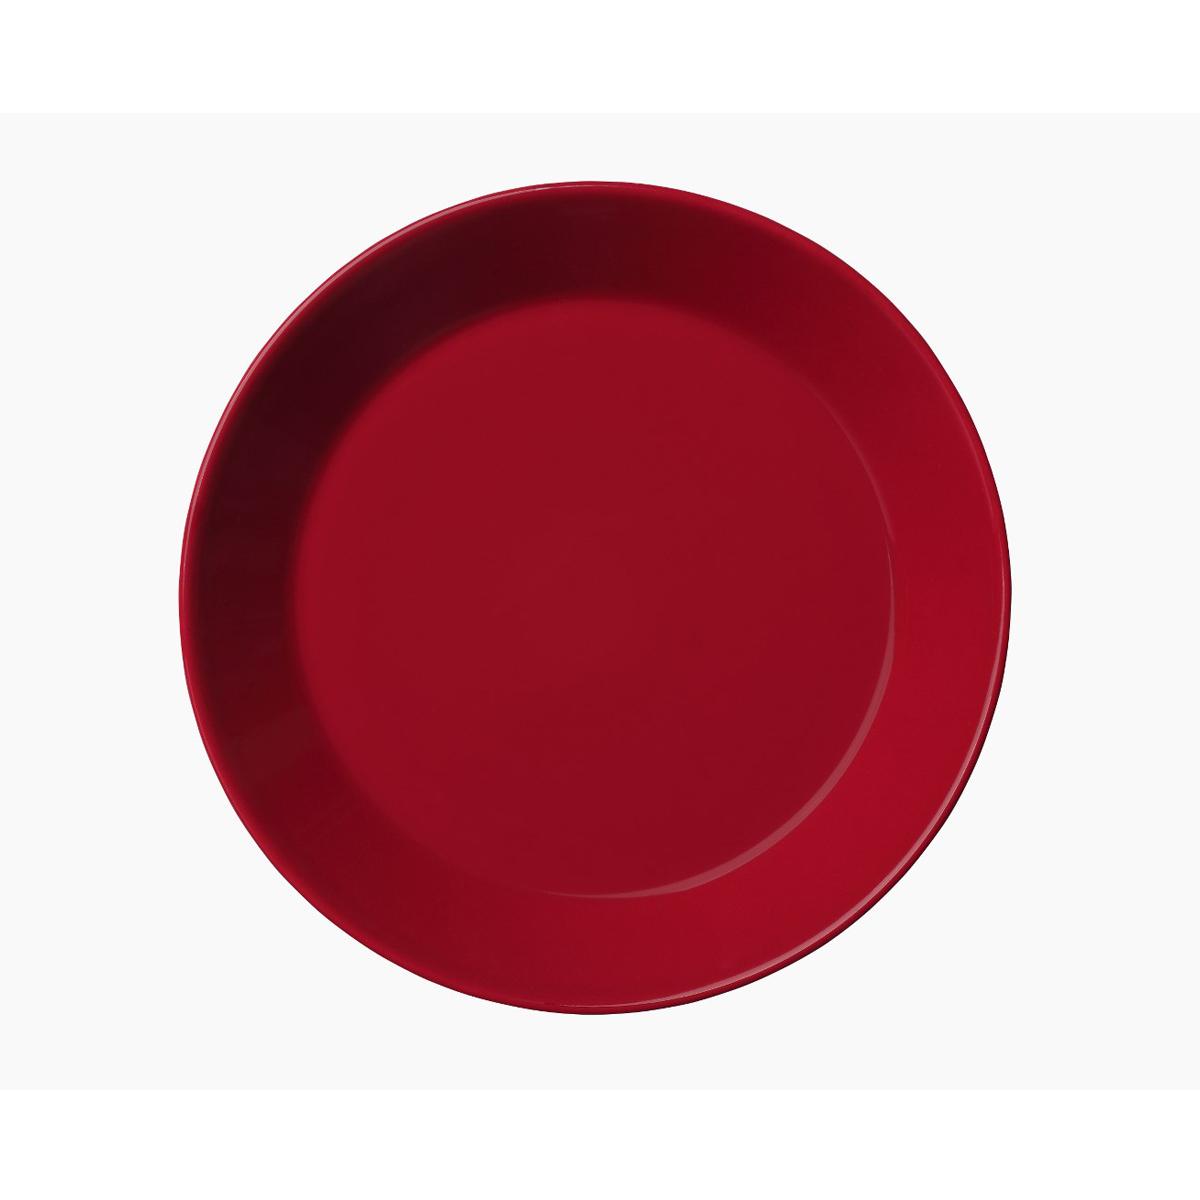 Teema_plate_17cm_red